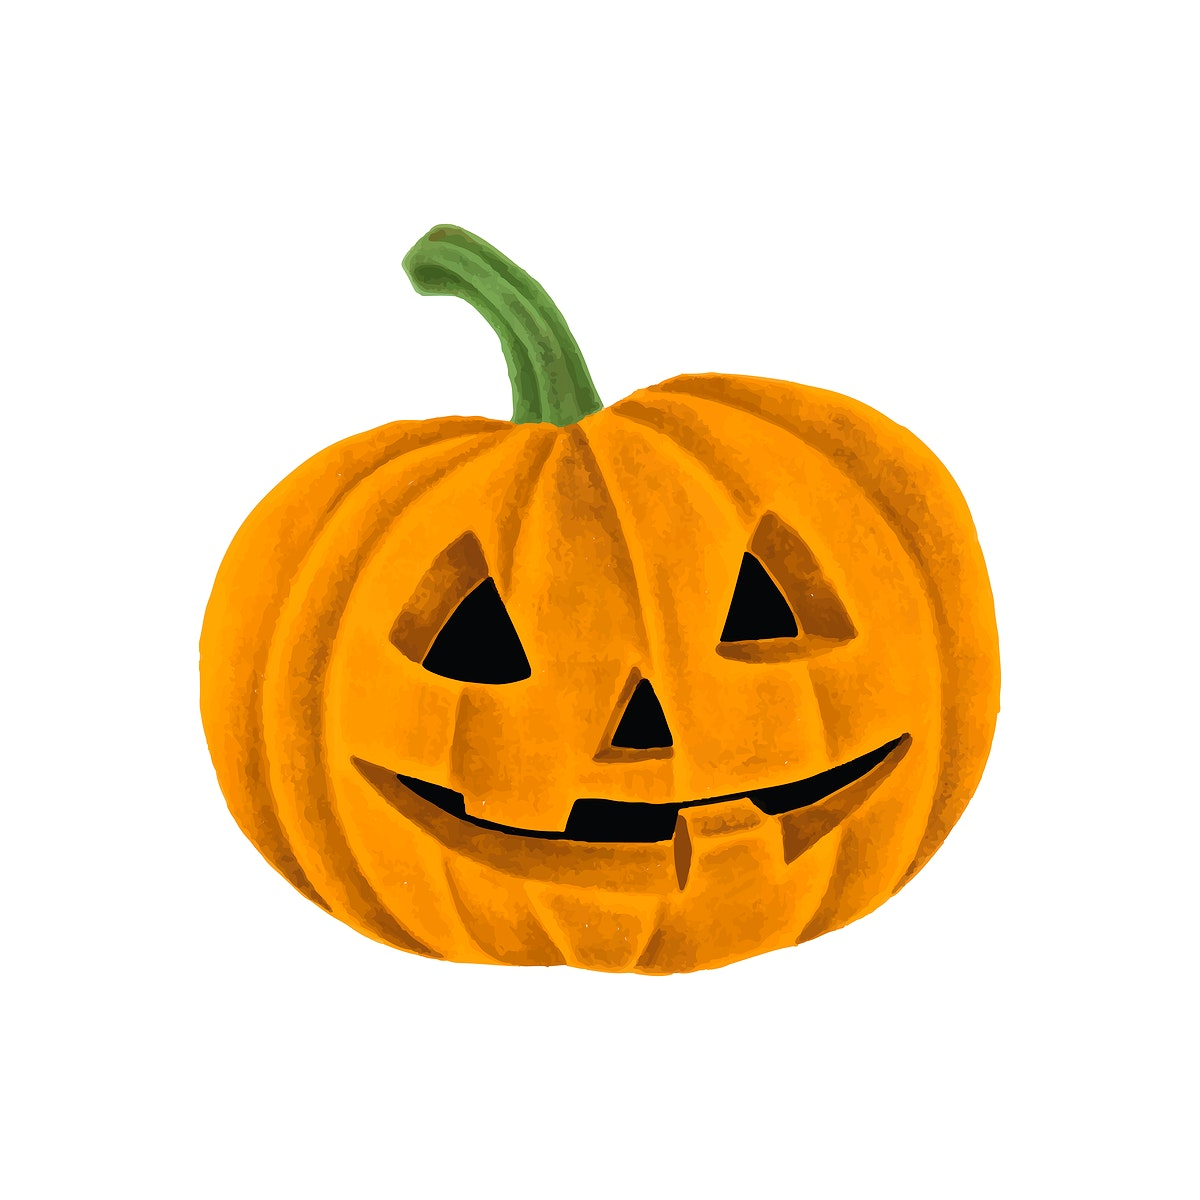 Hand drawn Halloween pumpkin jack-o'-lantern